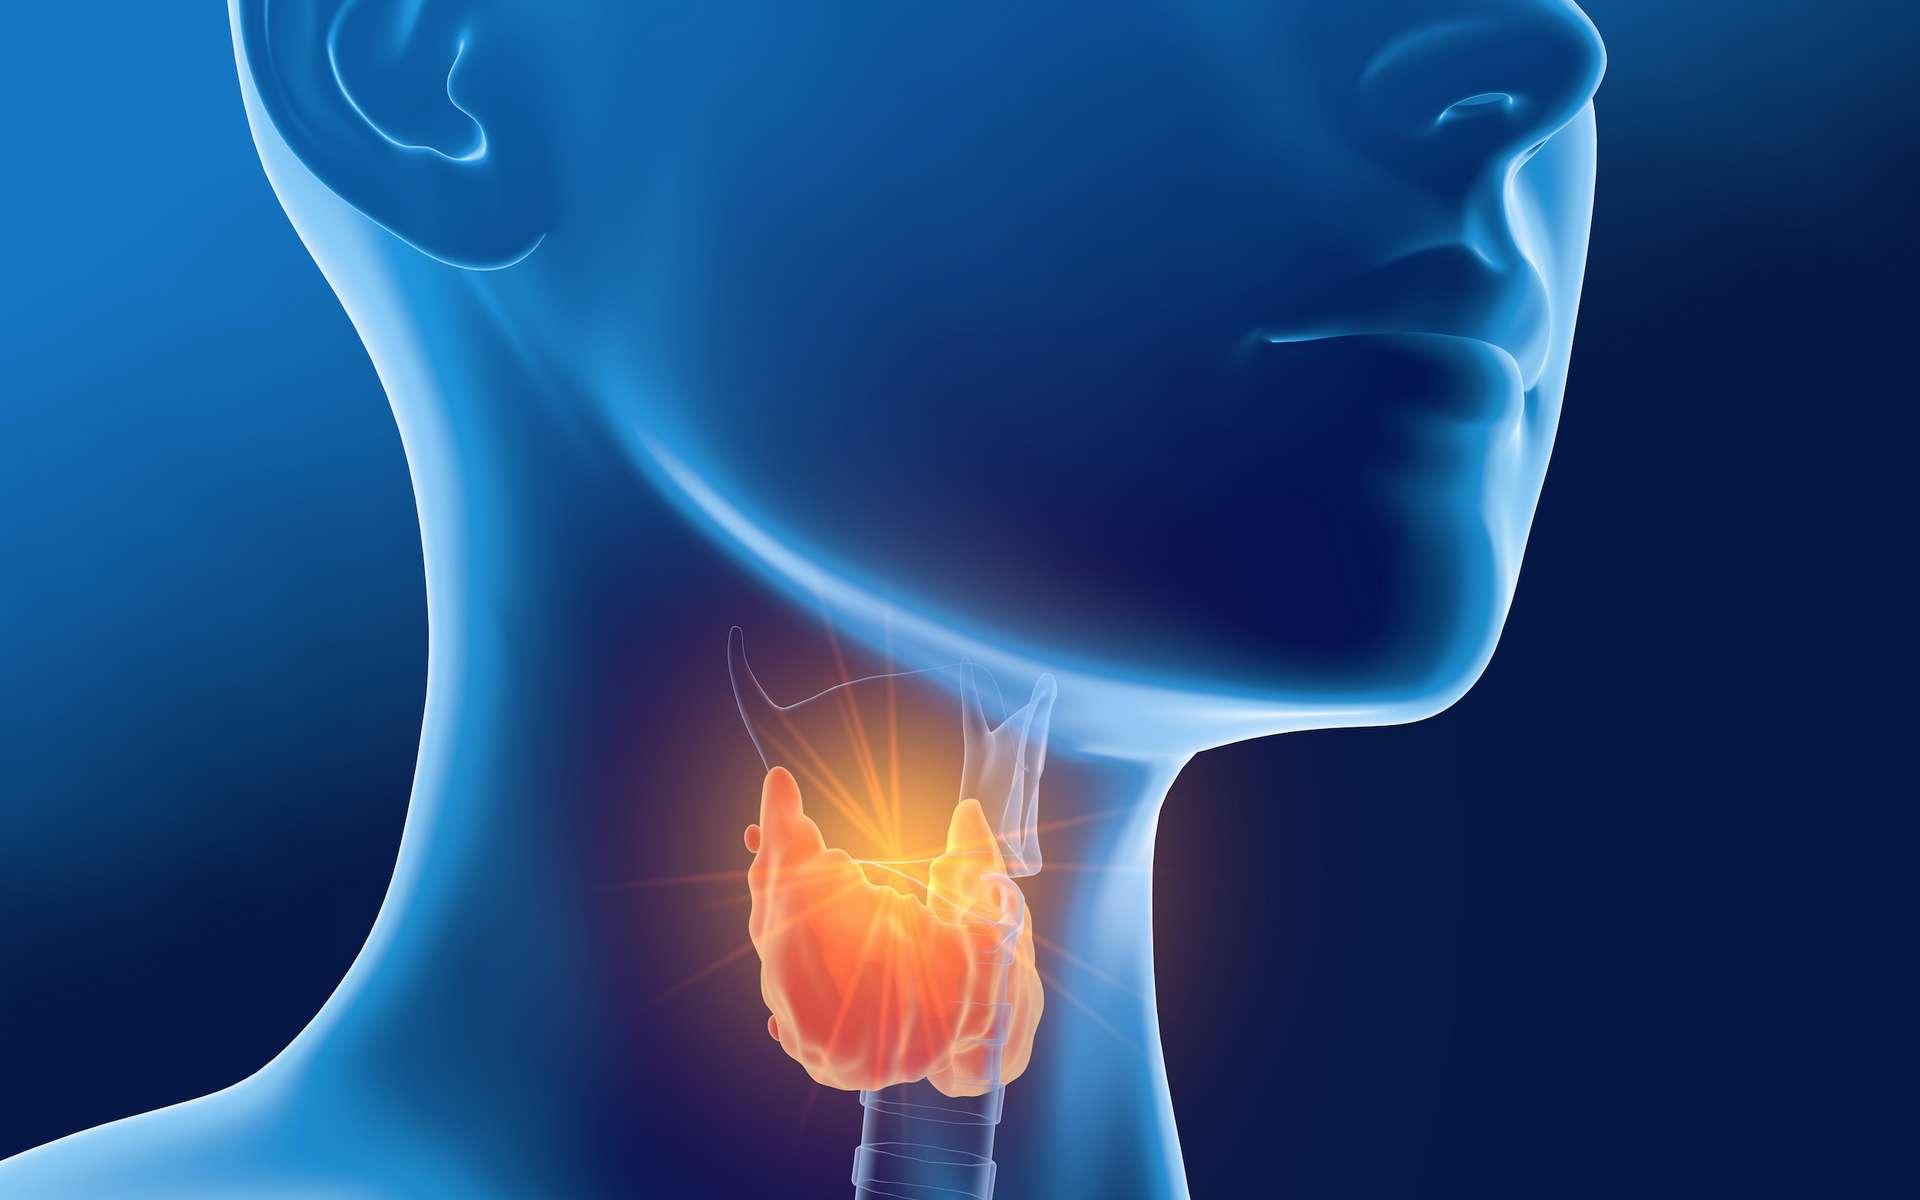 La maladie de Basedow est la première cause d'hyperthyroïdie chez les femmes. © Axel Kock, Adobe Stock